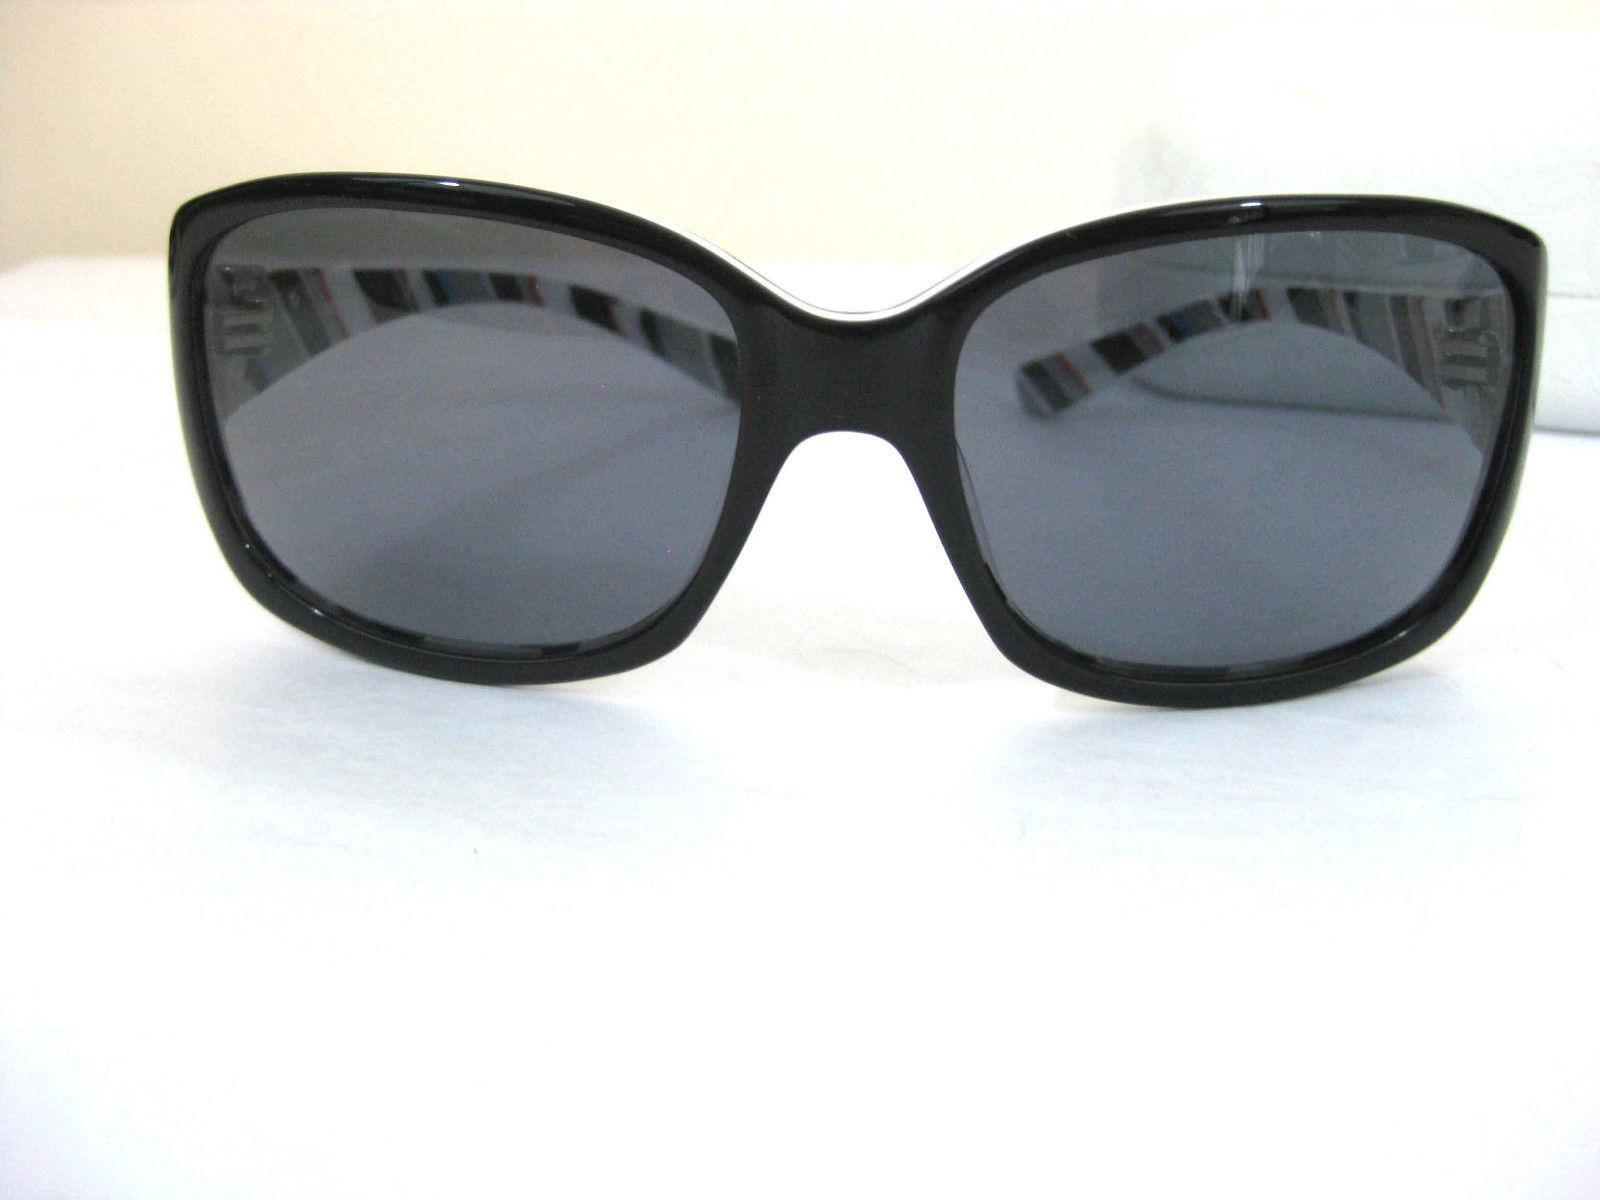 OAKLEY Sunglasses DISCREET Black Silver Inside Stripes  White Case * FORD RACING